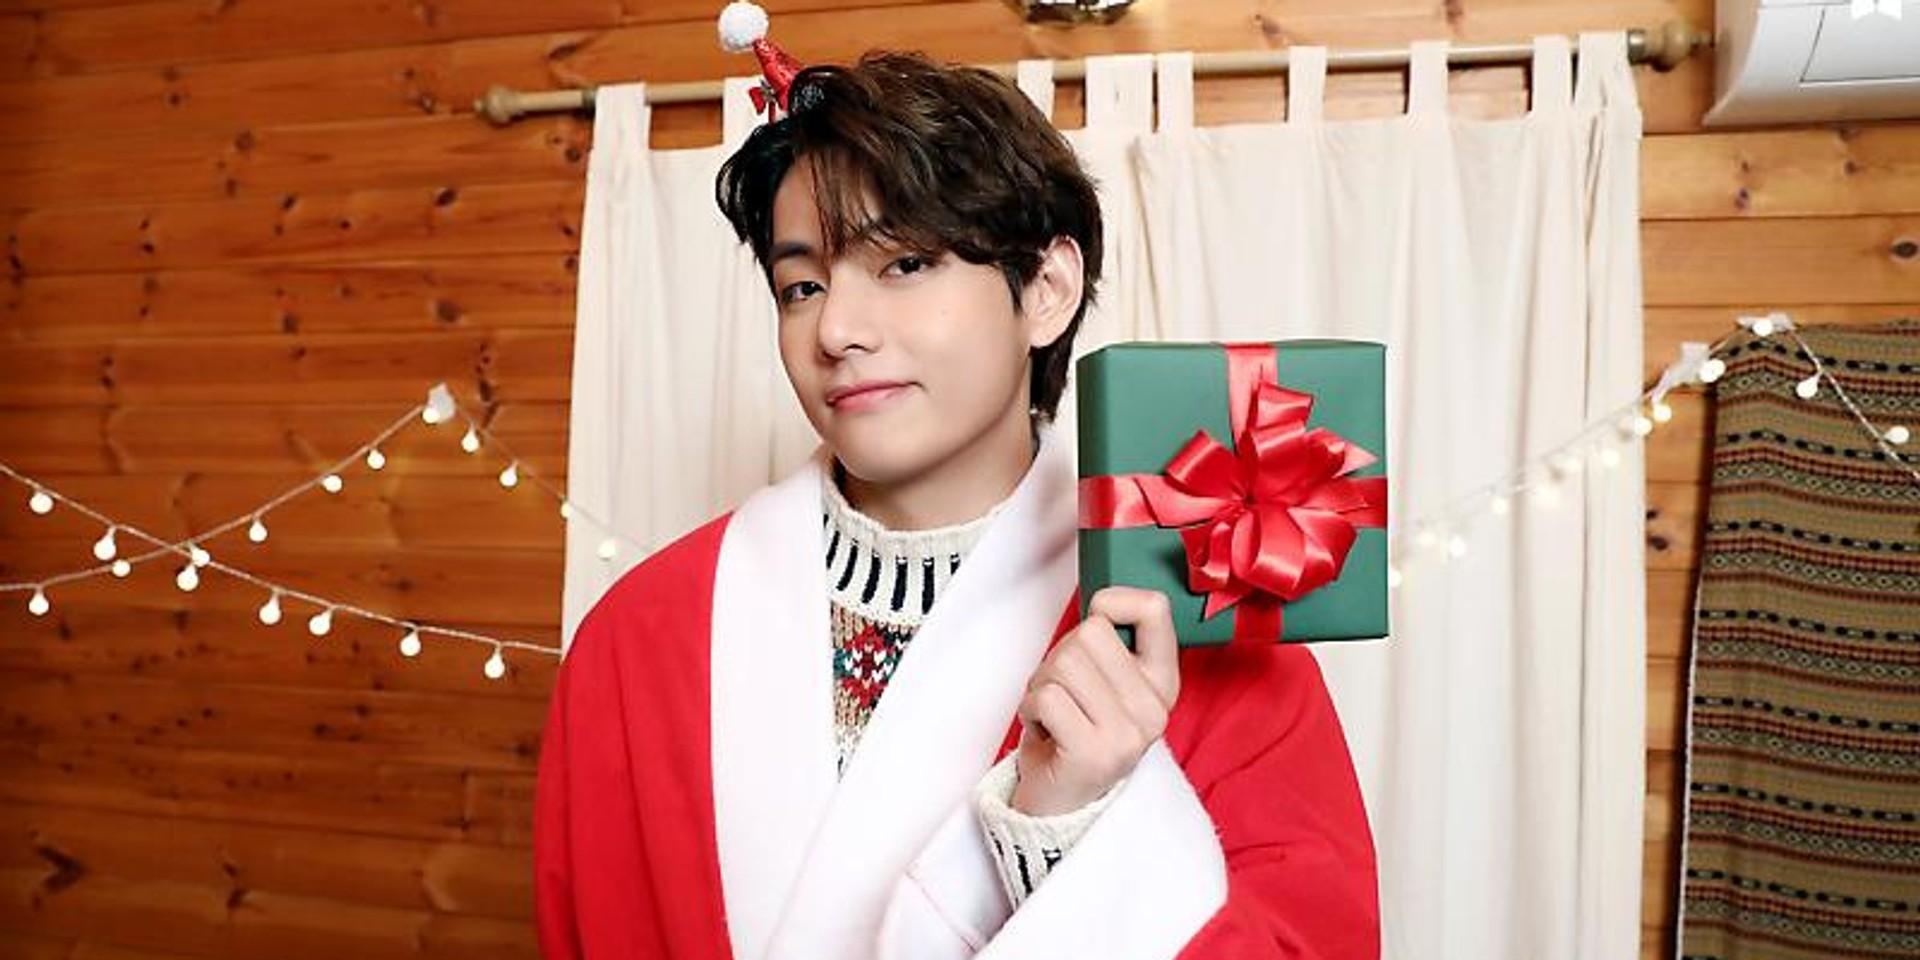 BTS' V releases new track featuring Peakboy, 'Snow Flower' – listen